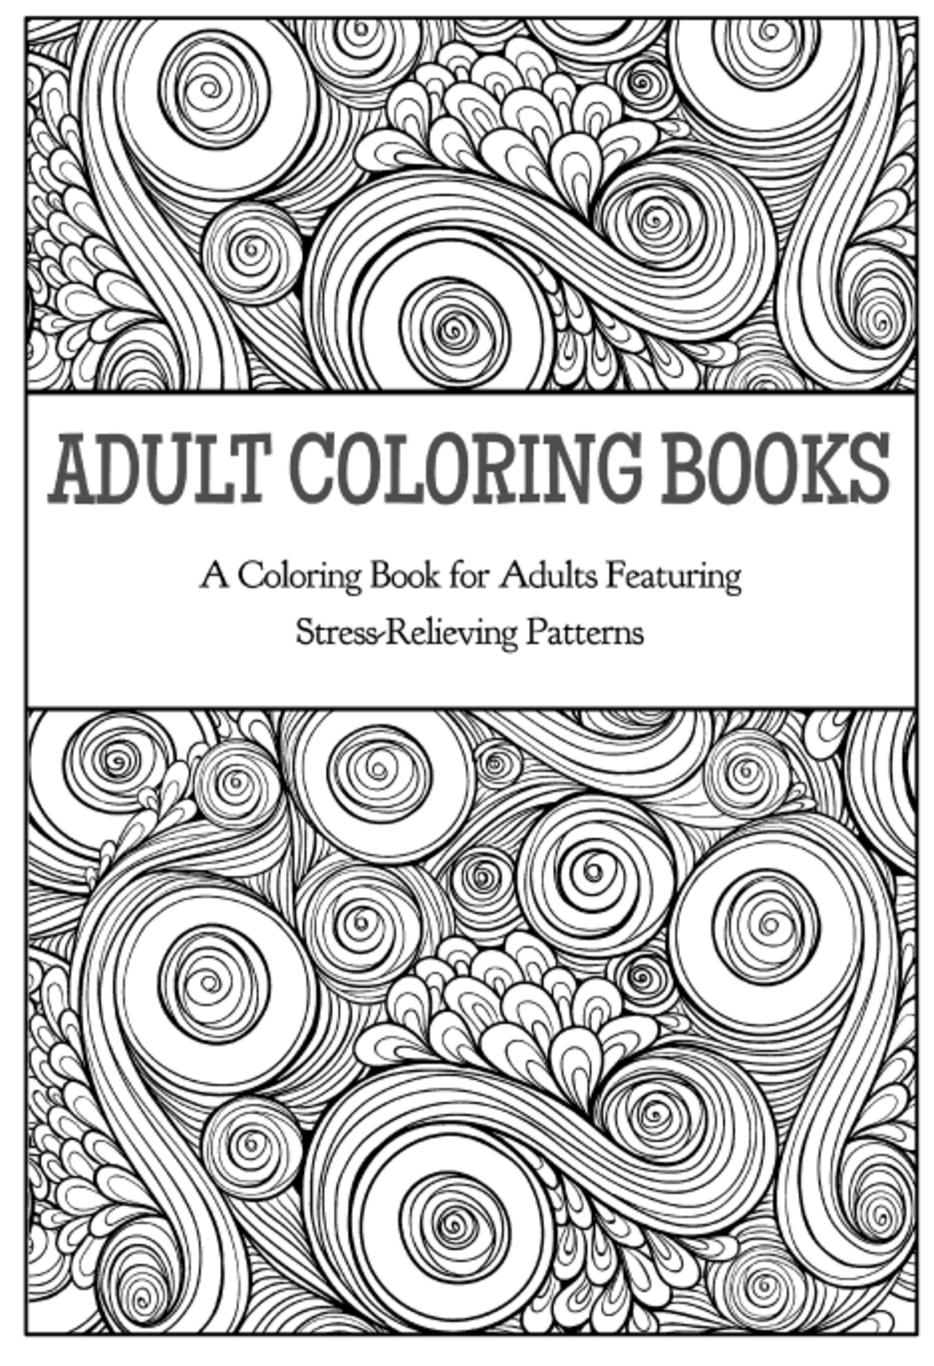 Adult Coloring Books - Top 100 - Joyful Abode